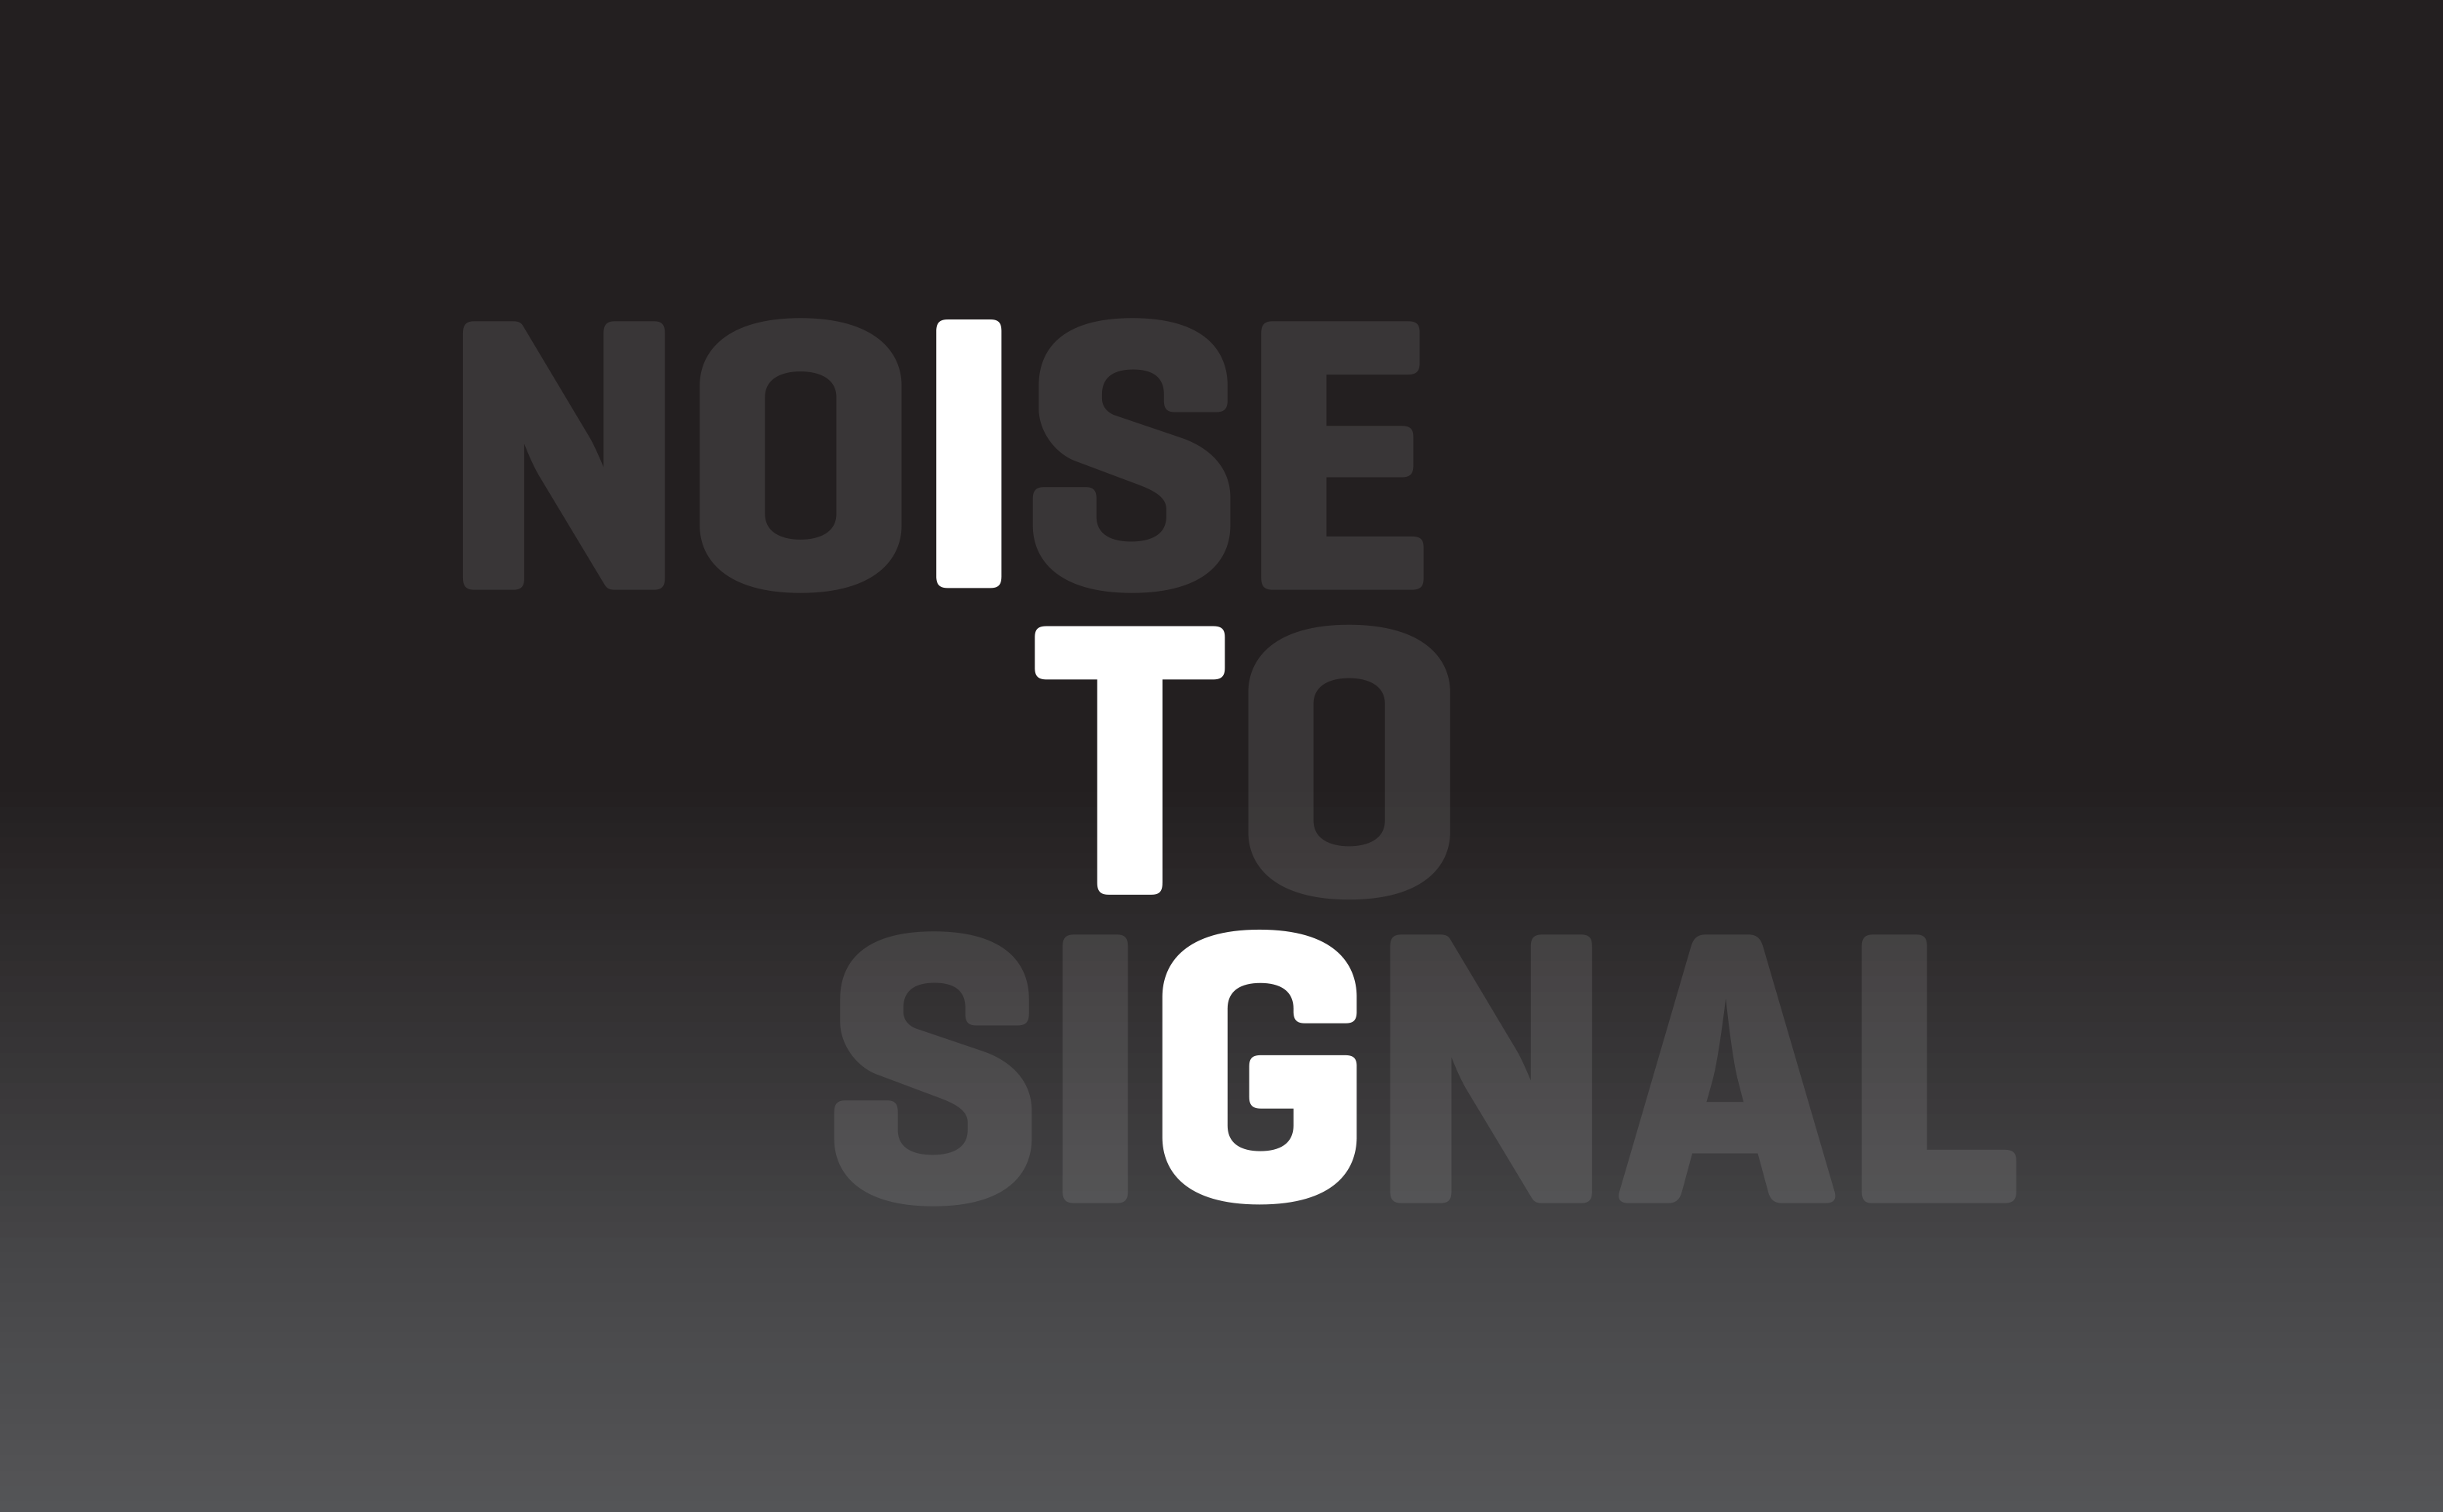 ITG NoiseToSignal